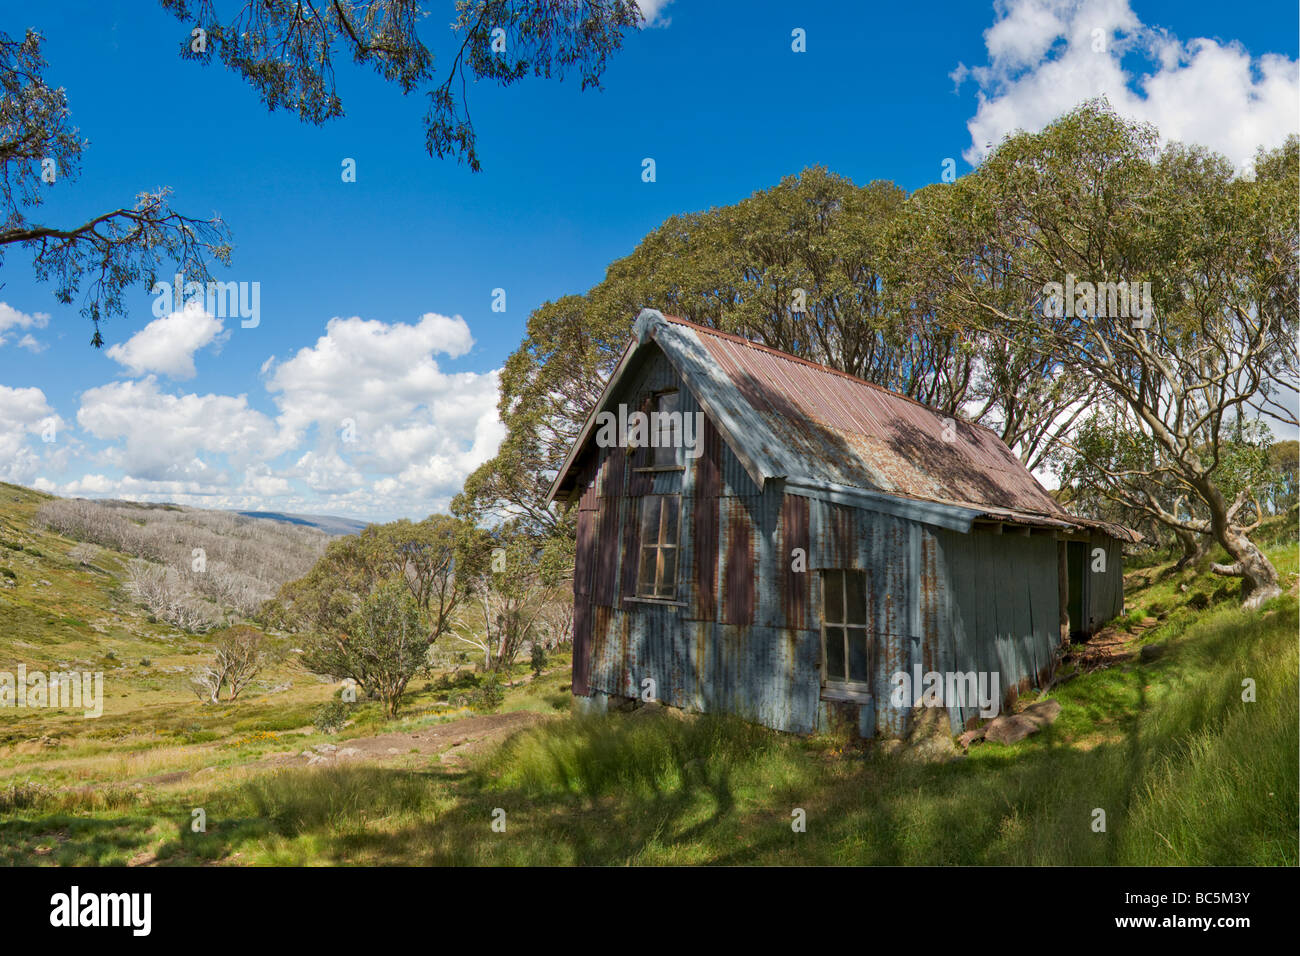 Cope Hut on the Bogong High Plains, Victoria, Australia - Stock Image